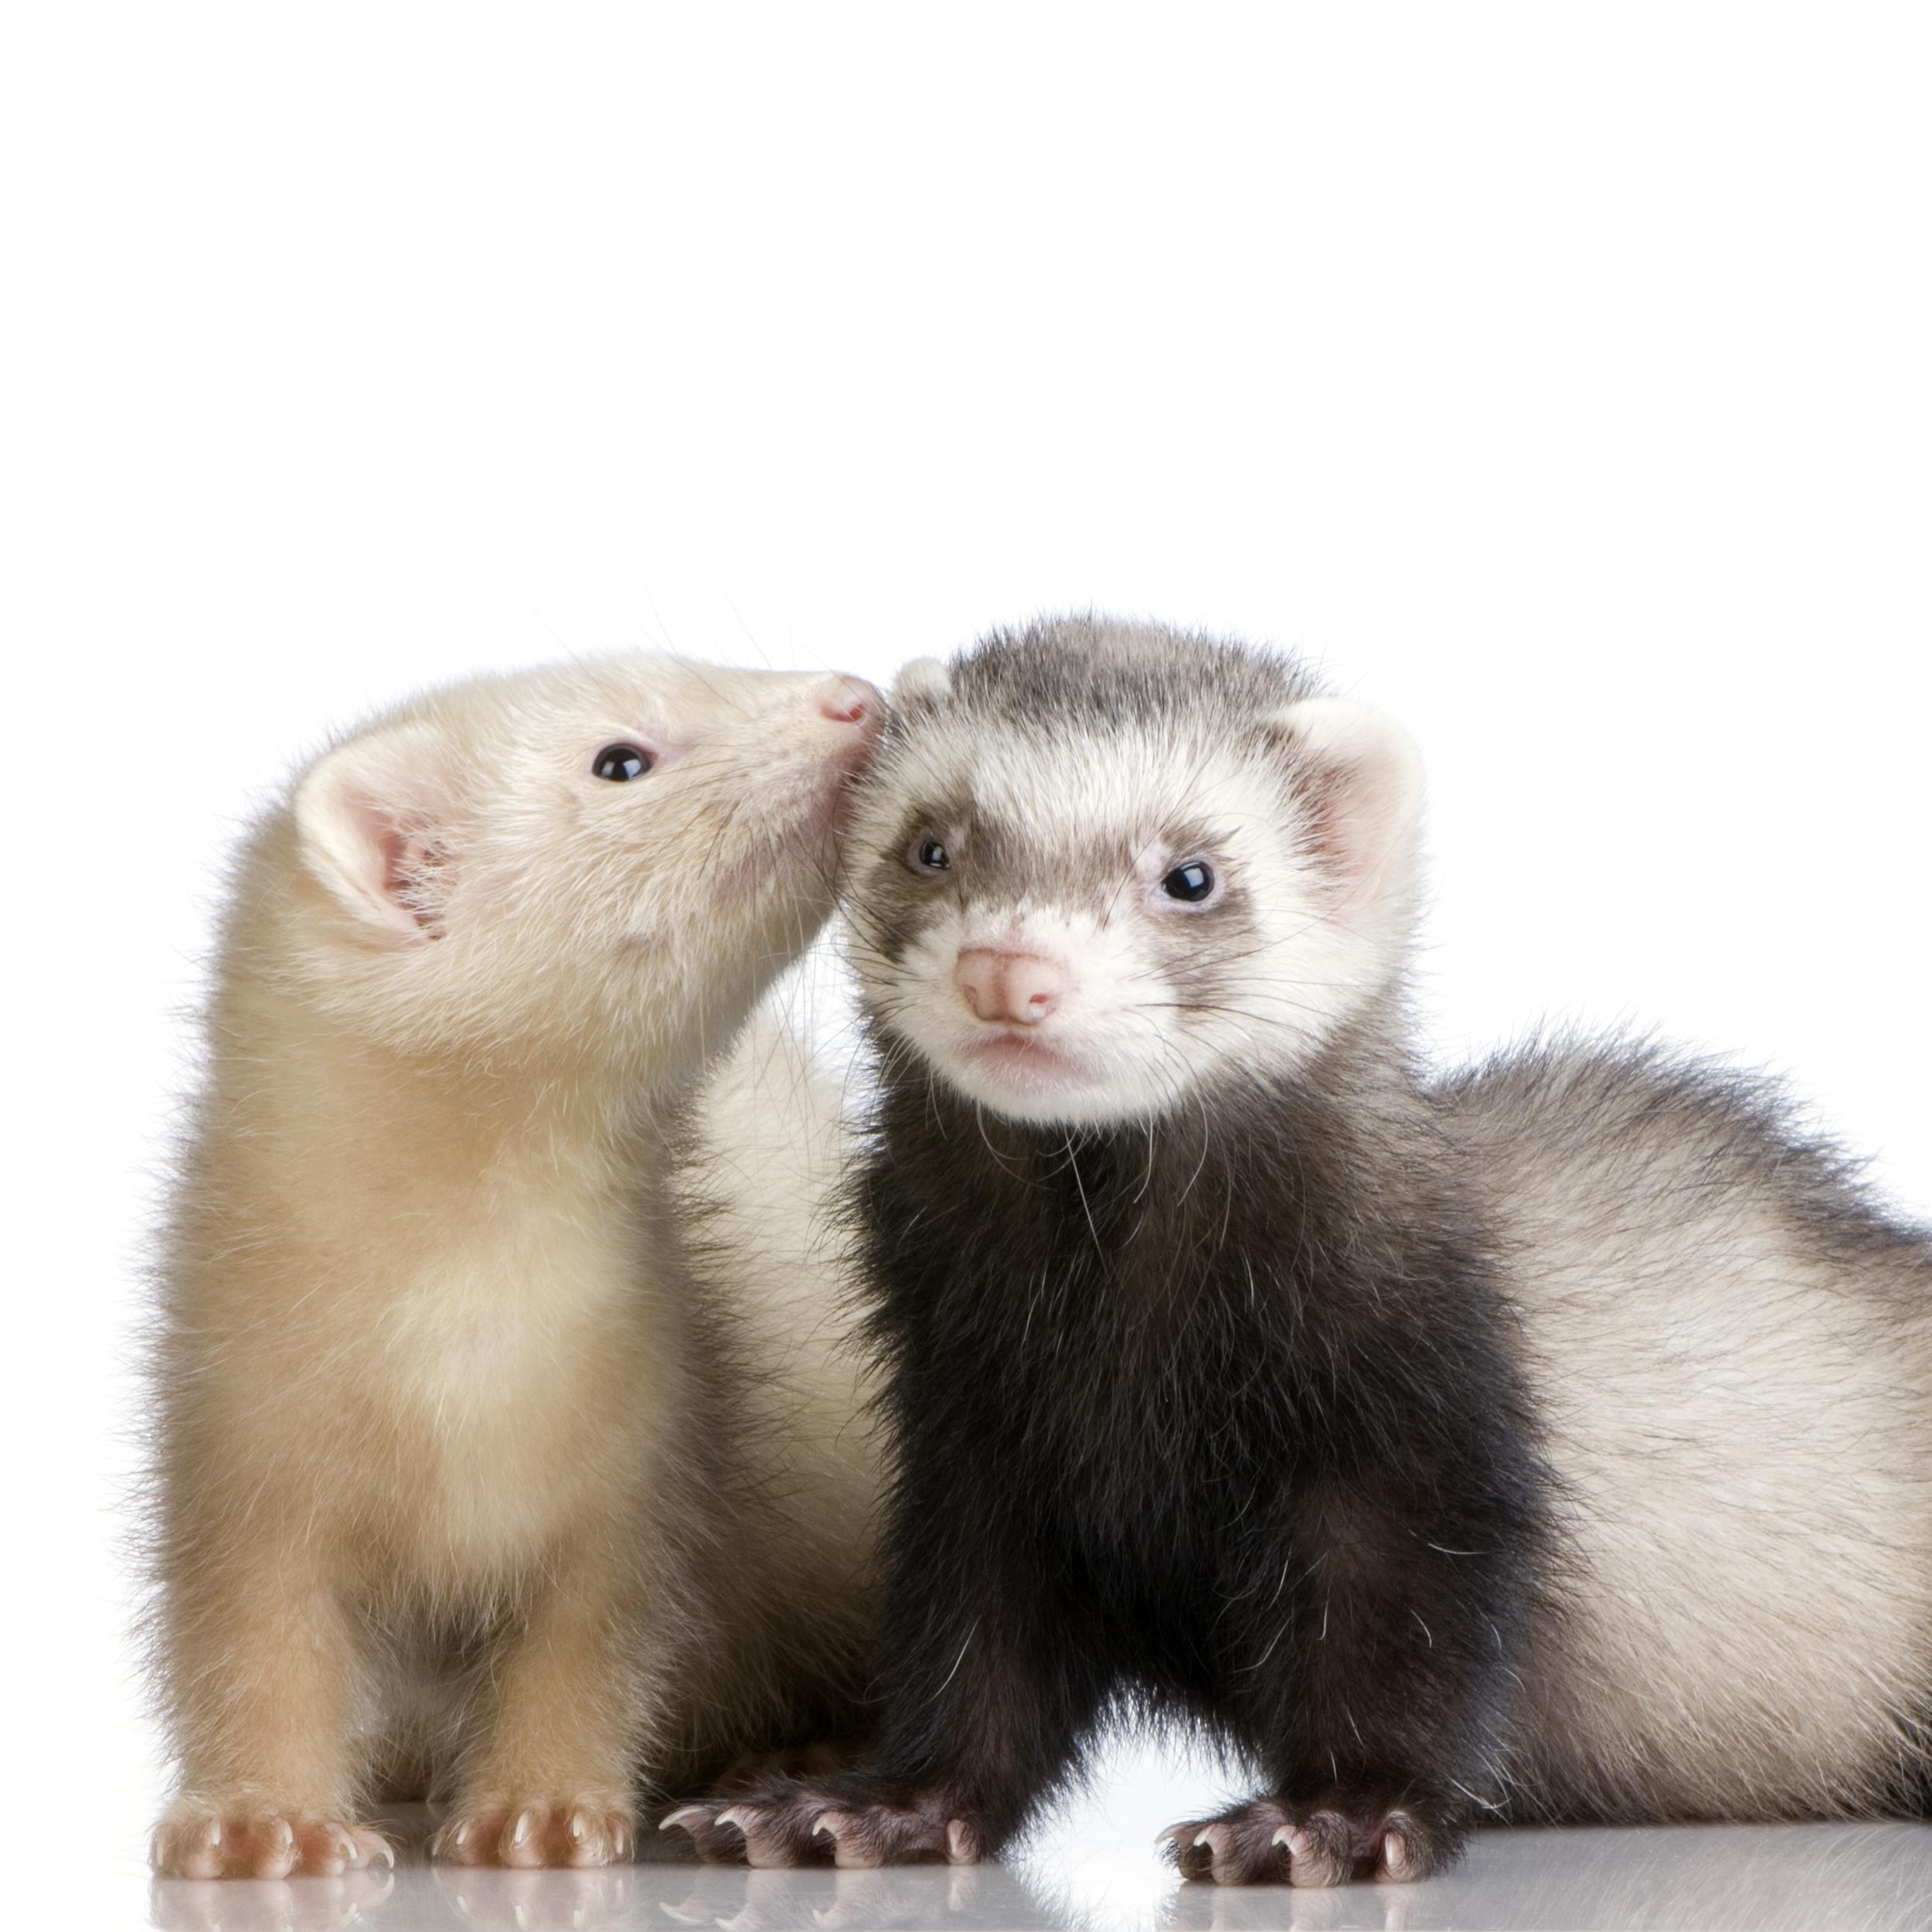 adopter un rat ou furet en animal de compagnie selfassurance. Black Bedroom Furniture Sets. Home Design Ideas